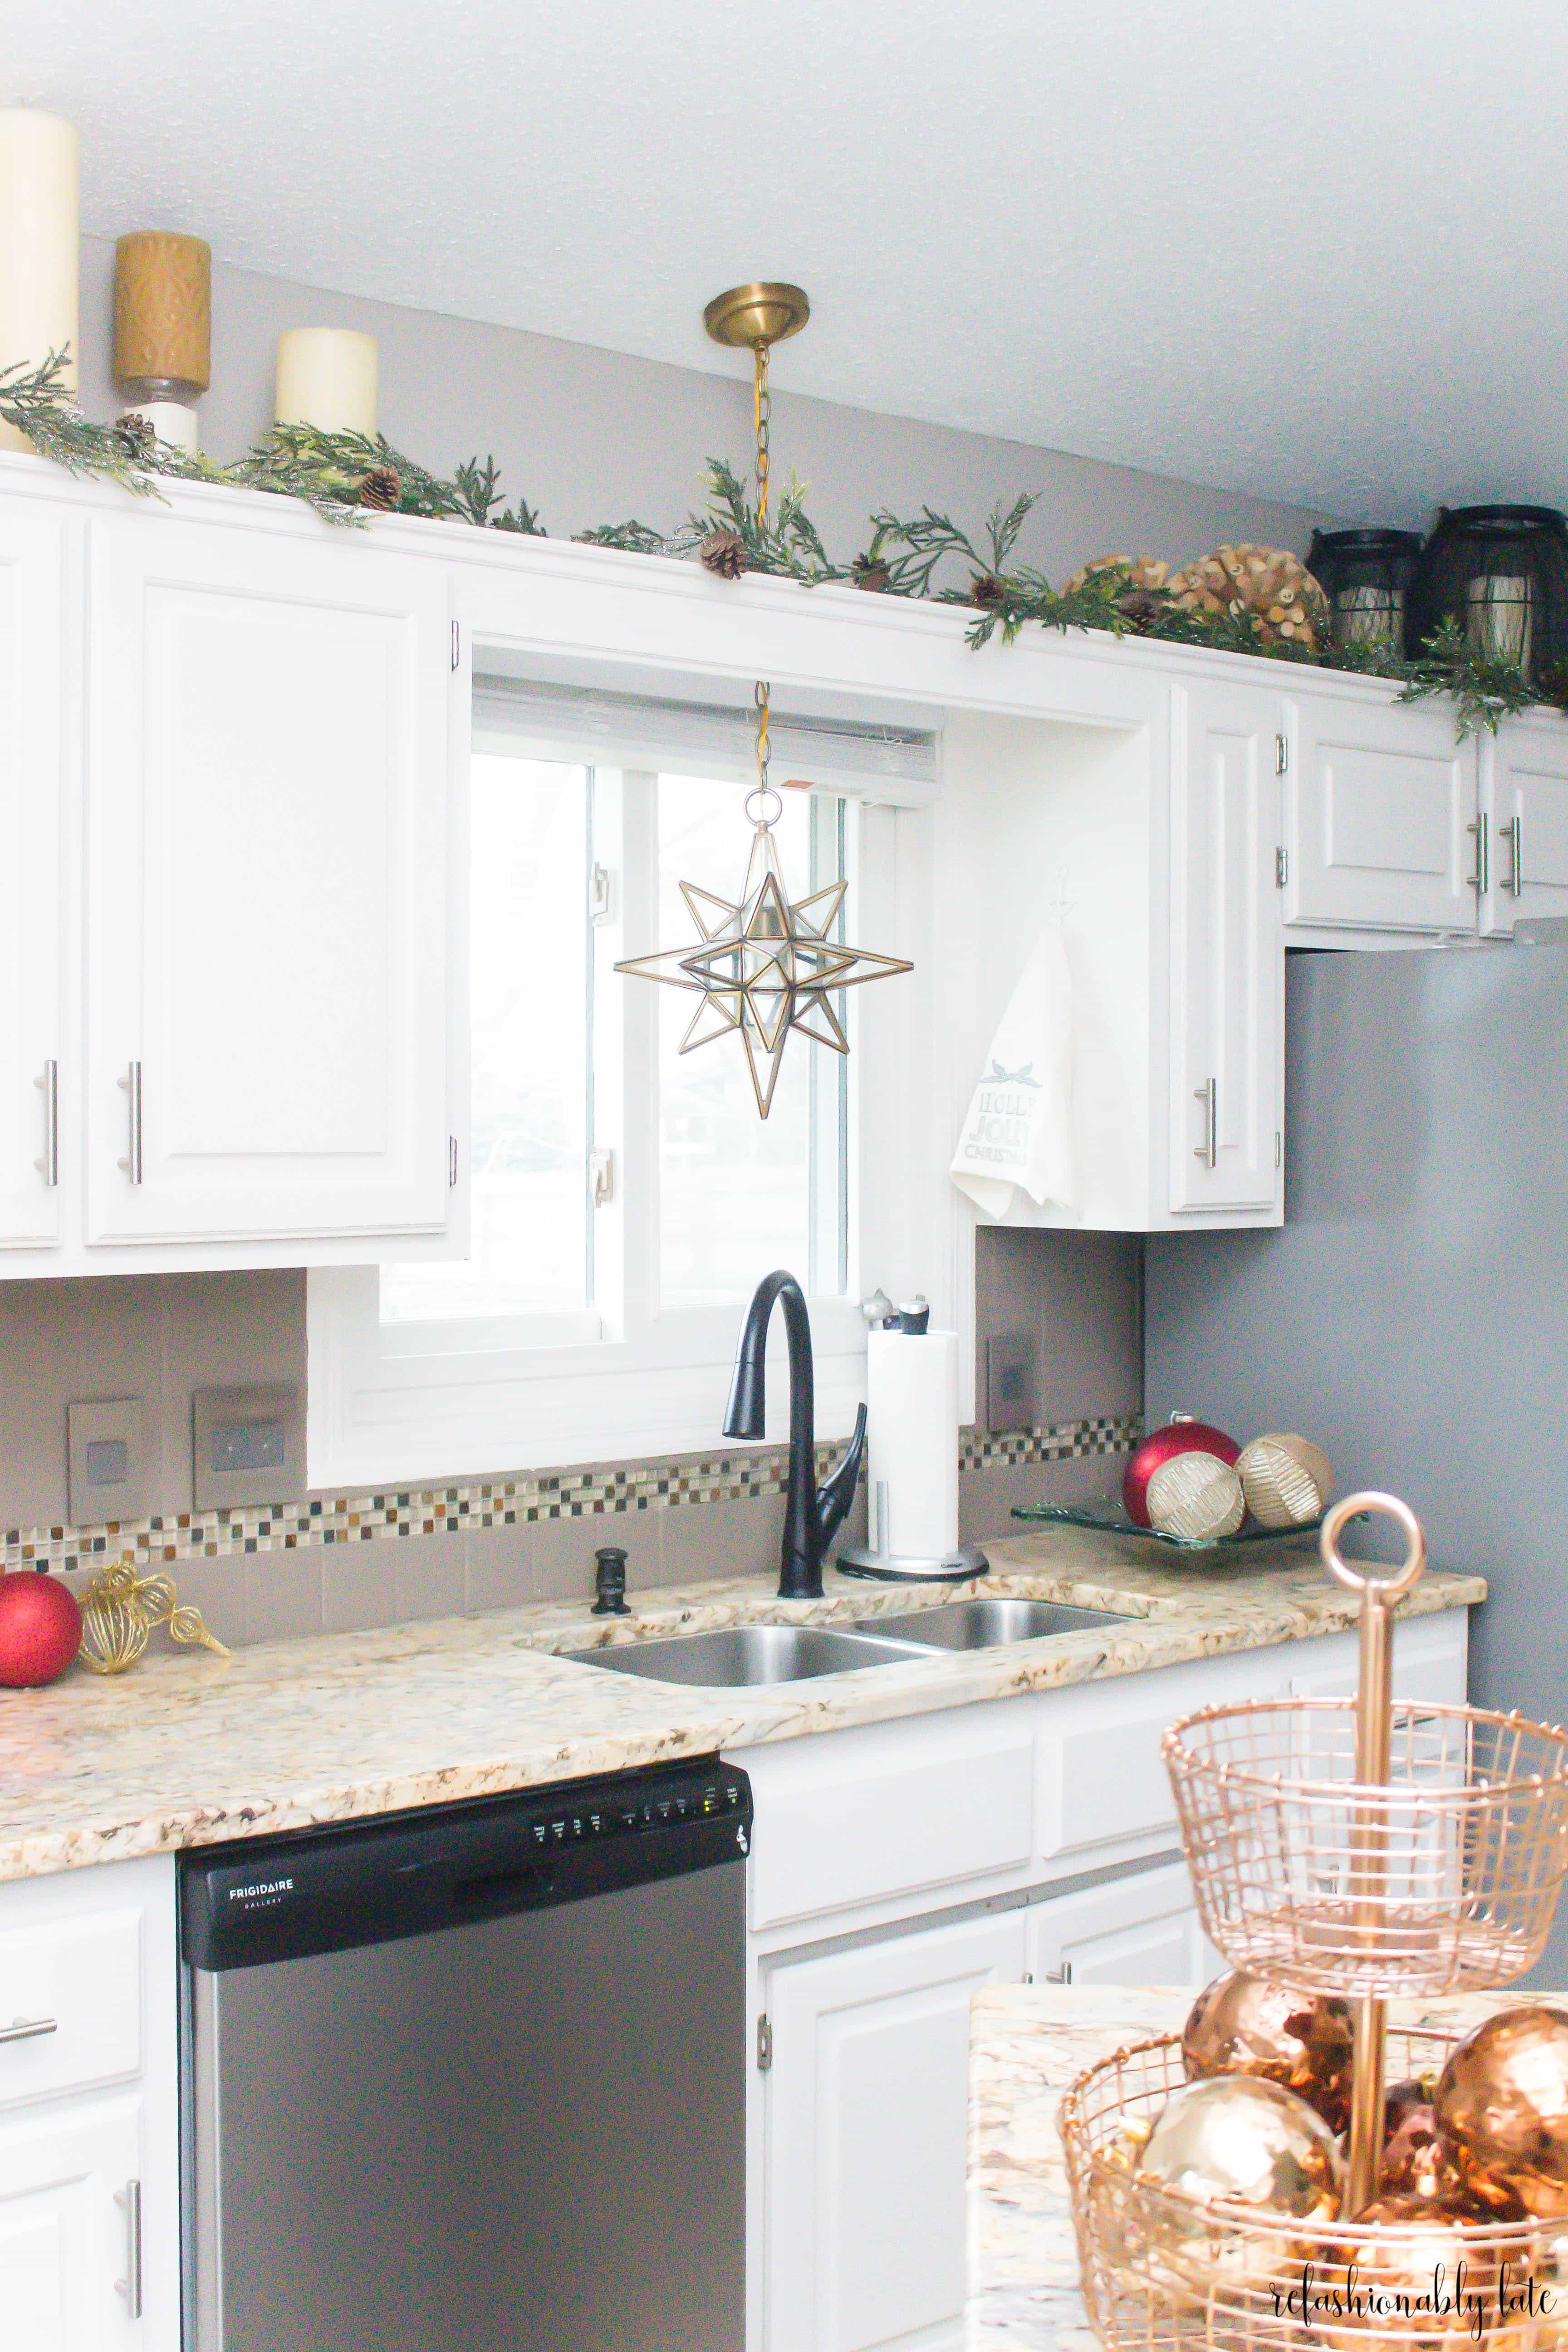 Christmas kitchen home tour • refashionably late